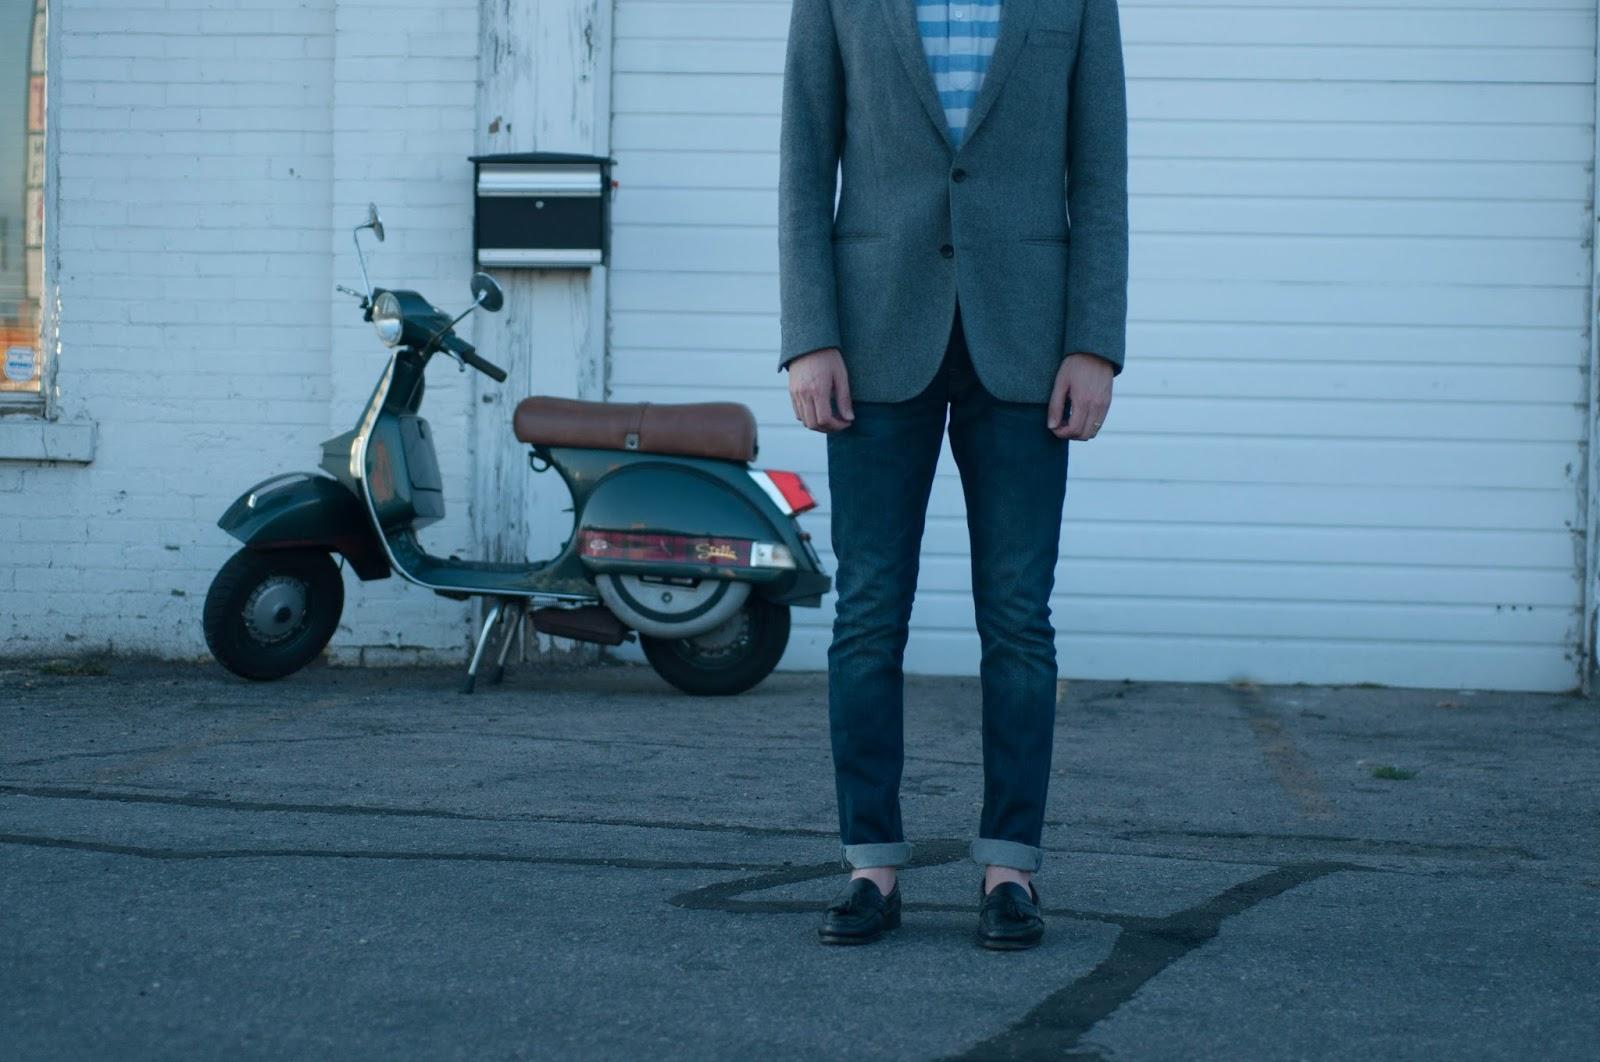 mens style, mens fashion, ootd, jcrew short sleeve pop over shirt, vespa, jcrew, all saints cigarette jeans